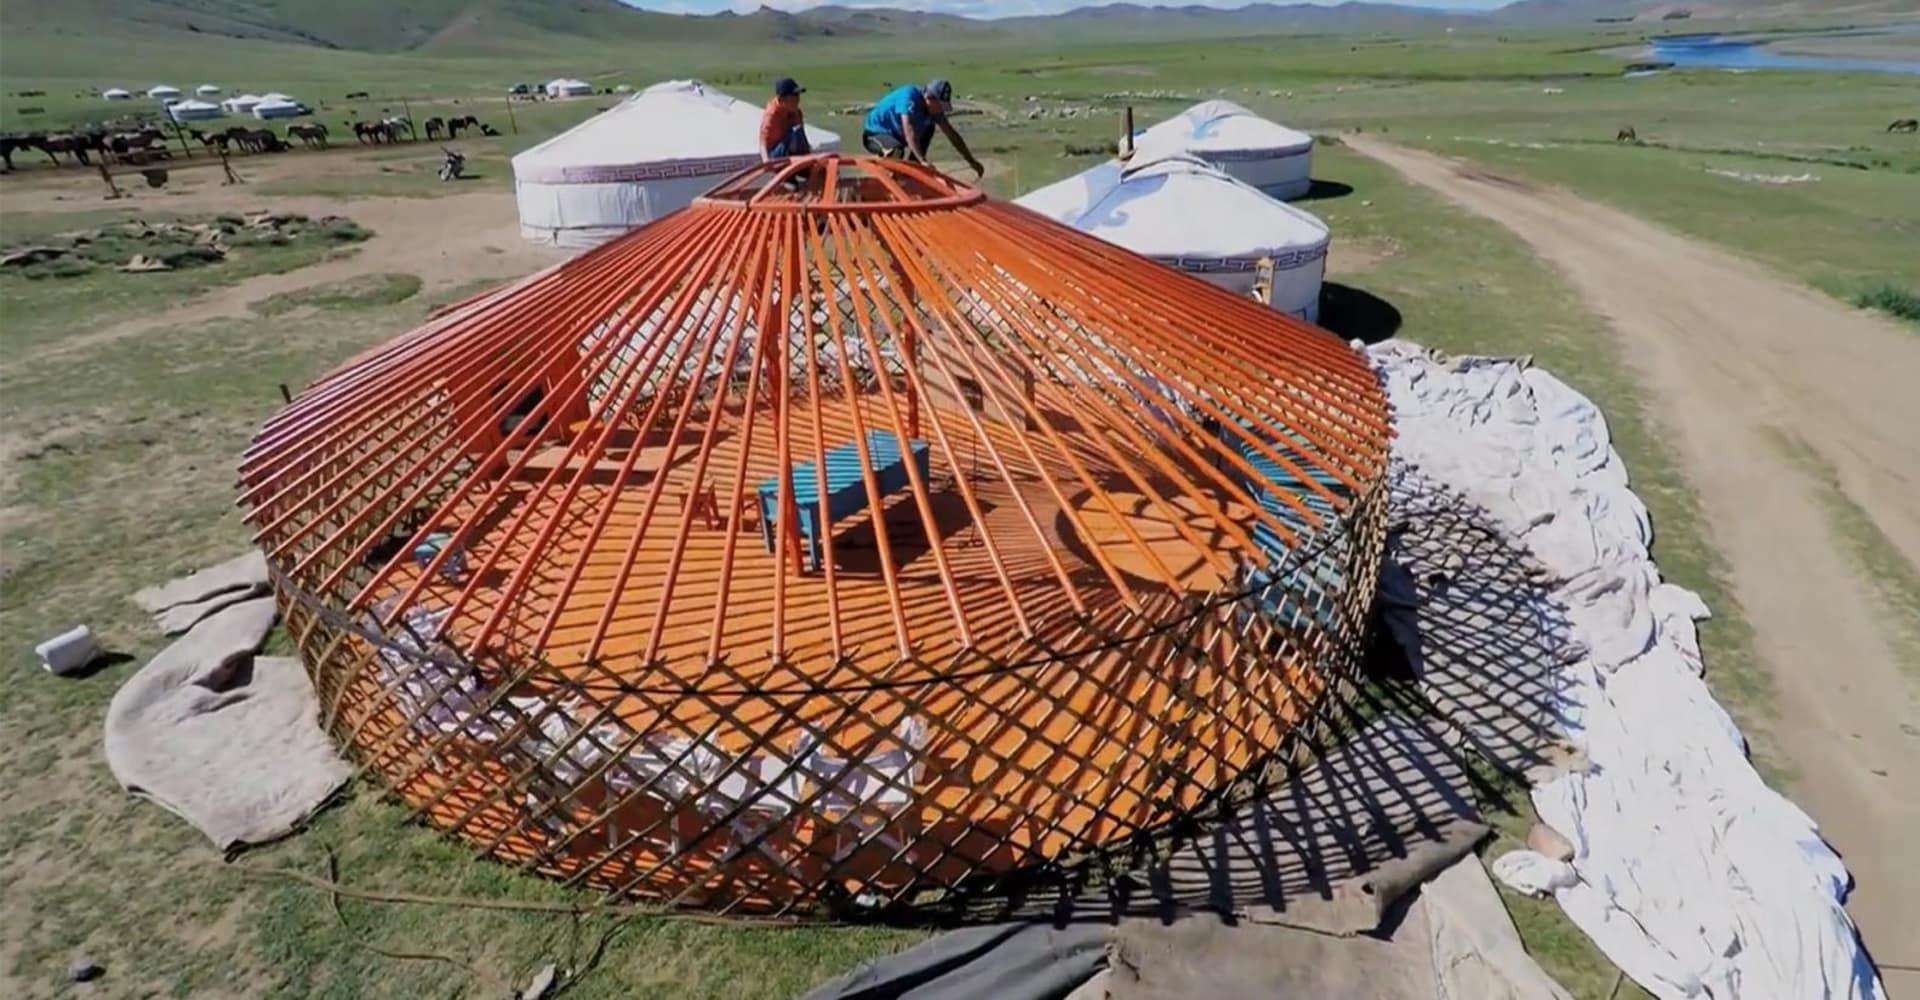 ALL-INCLUSIVE - The Pavilions Mongolia